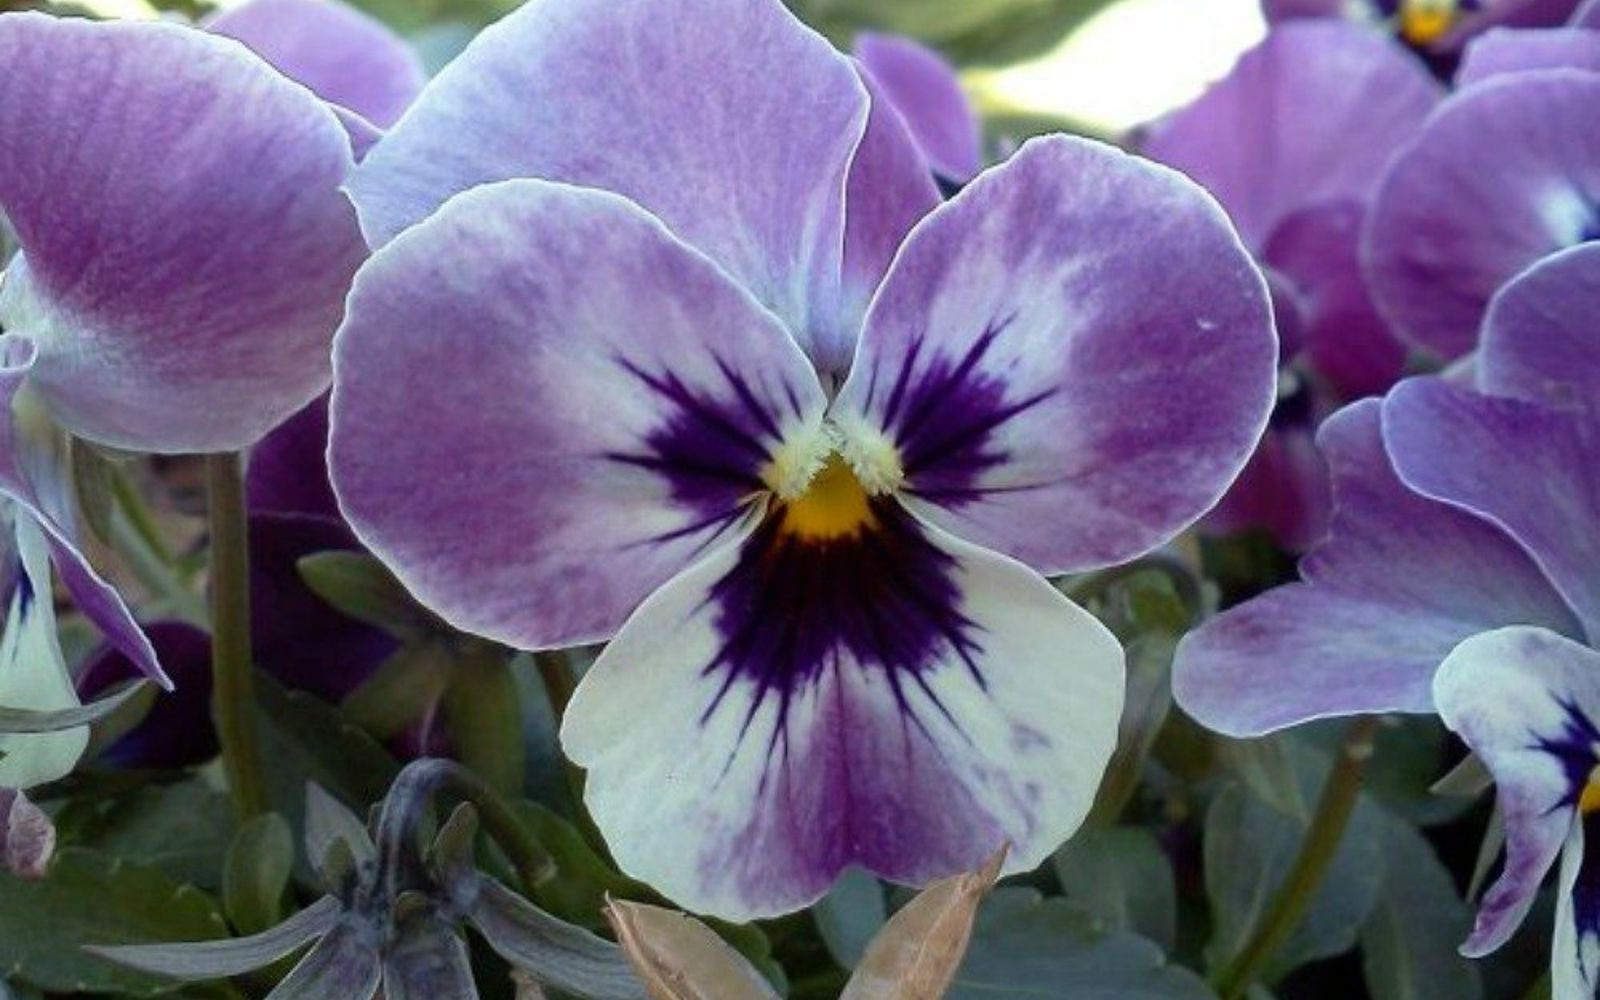 s the top 15 fall flowers everyone is loving this season, gardening, 15 Violas